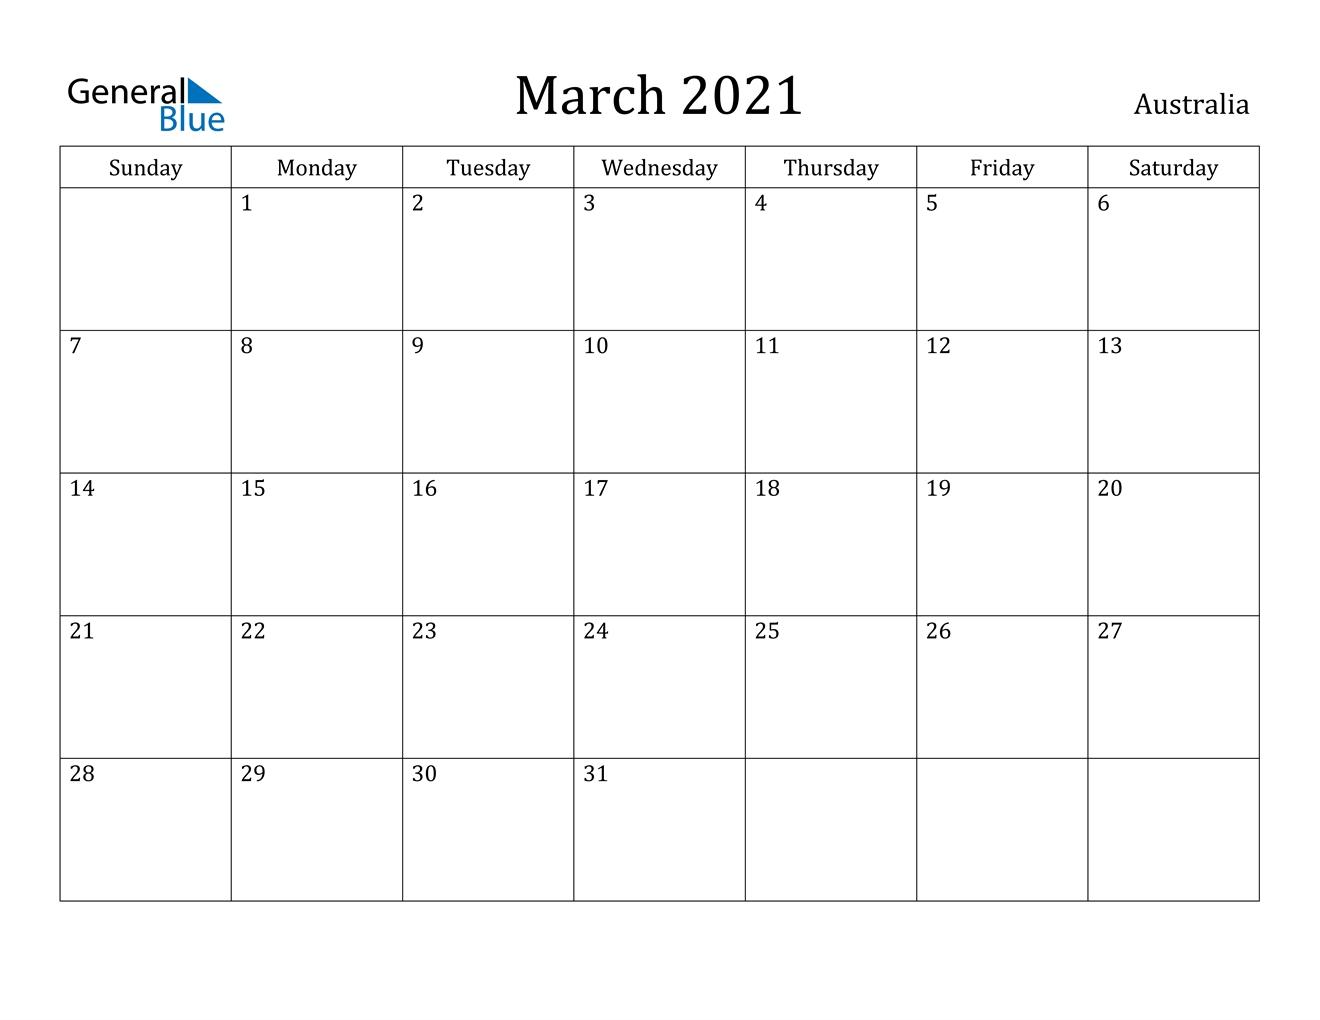 March 2021 Calendar - Australia regarding 2021 Australia Calendar With Holidays Photo